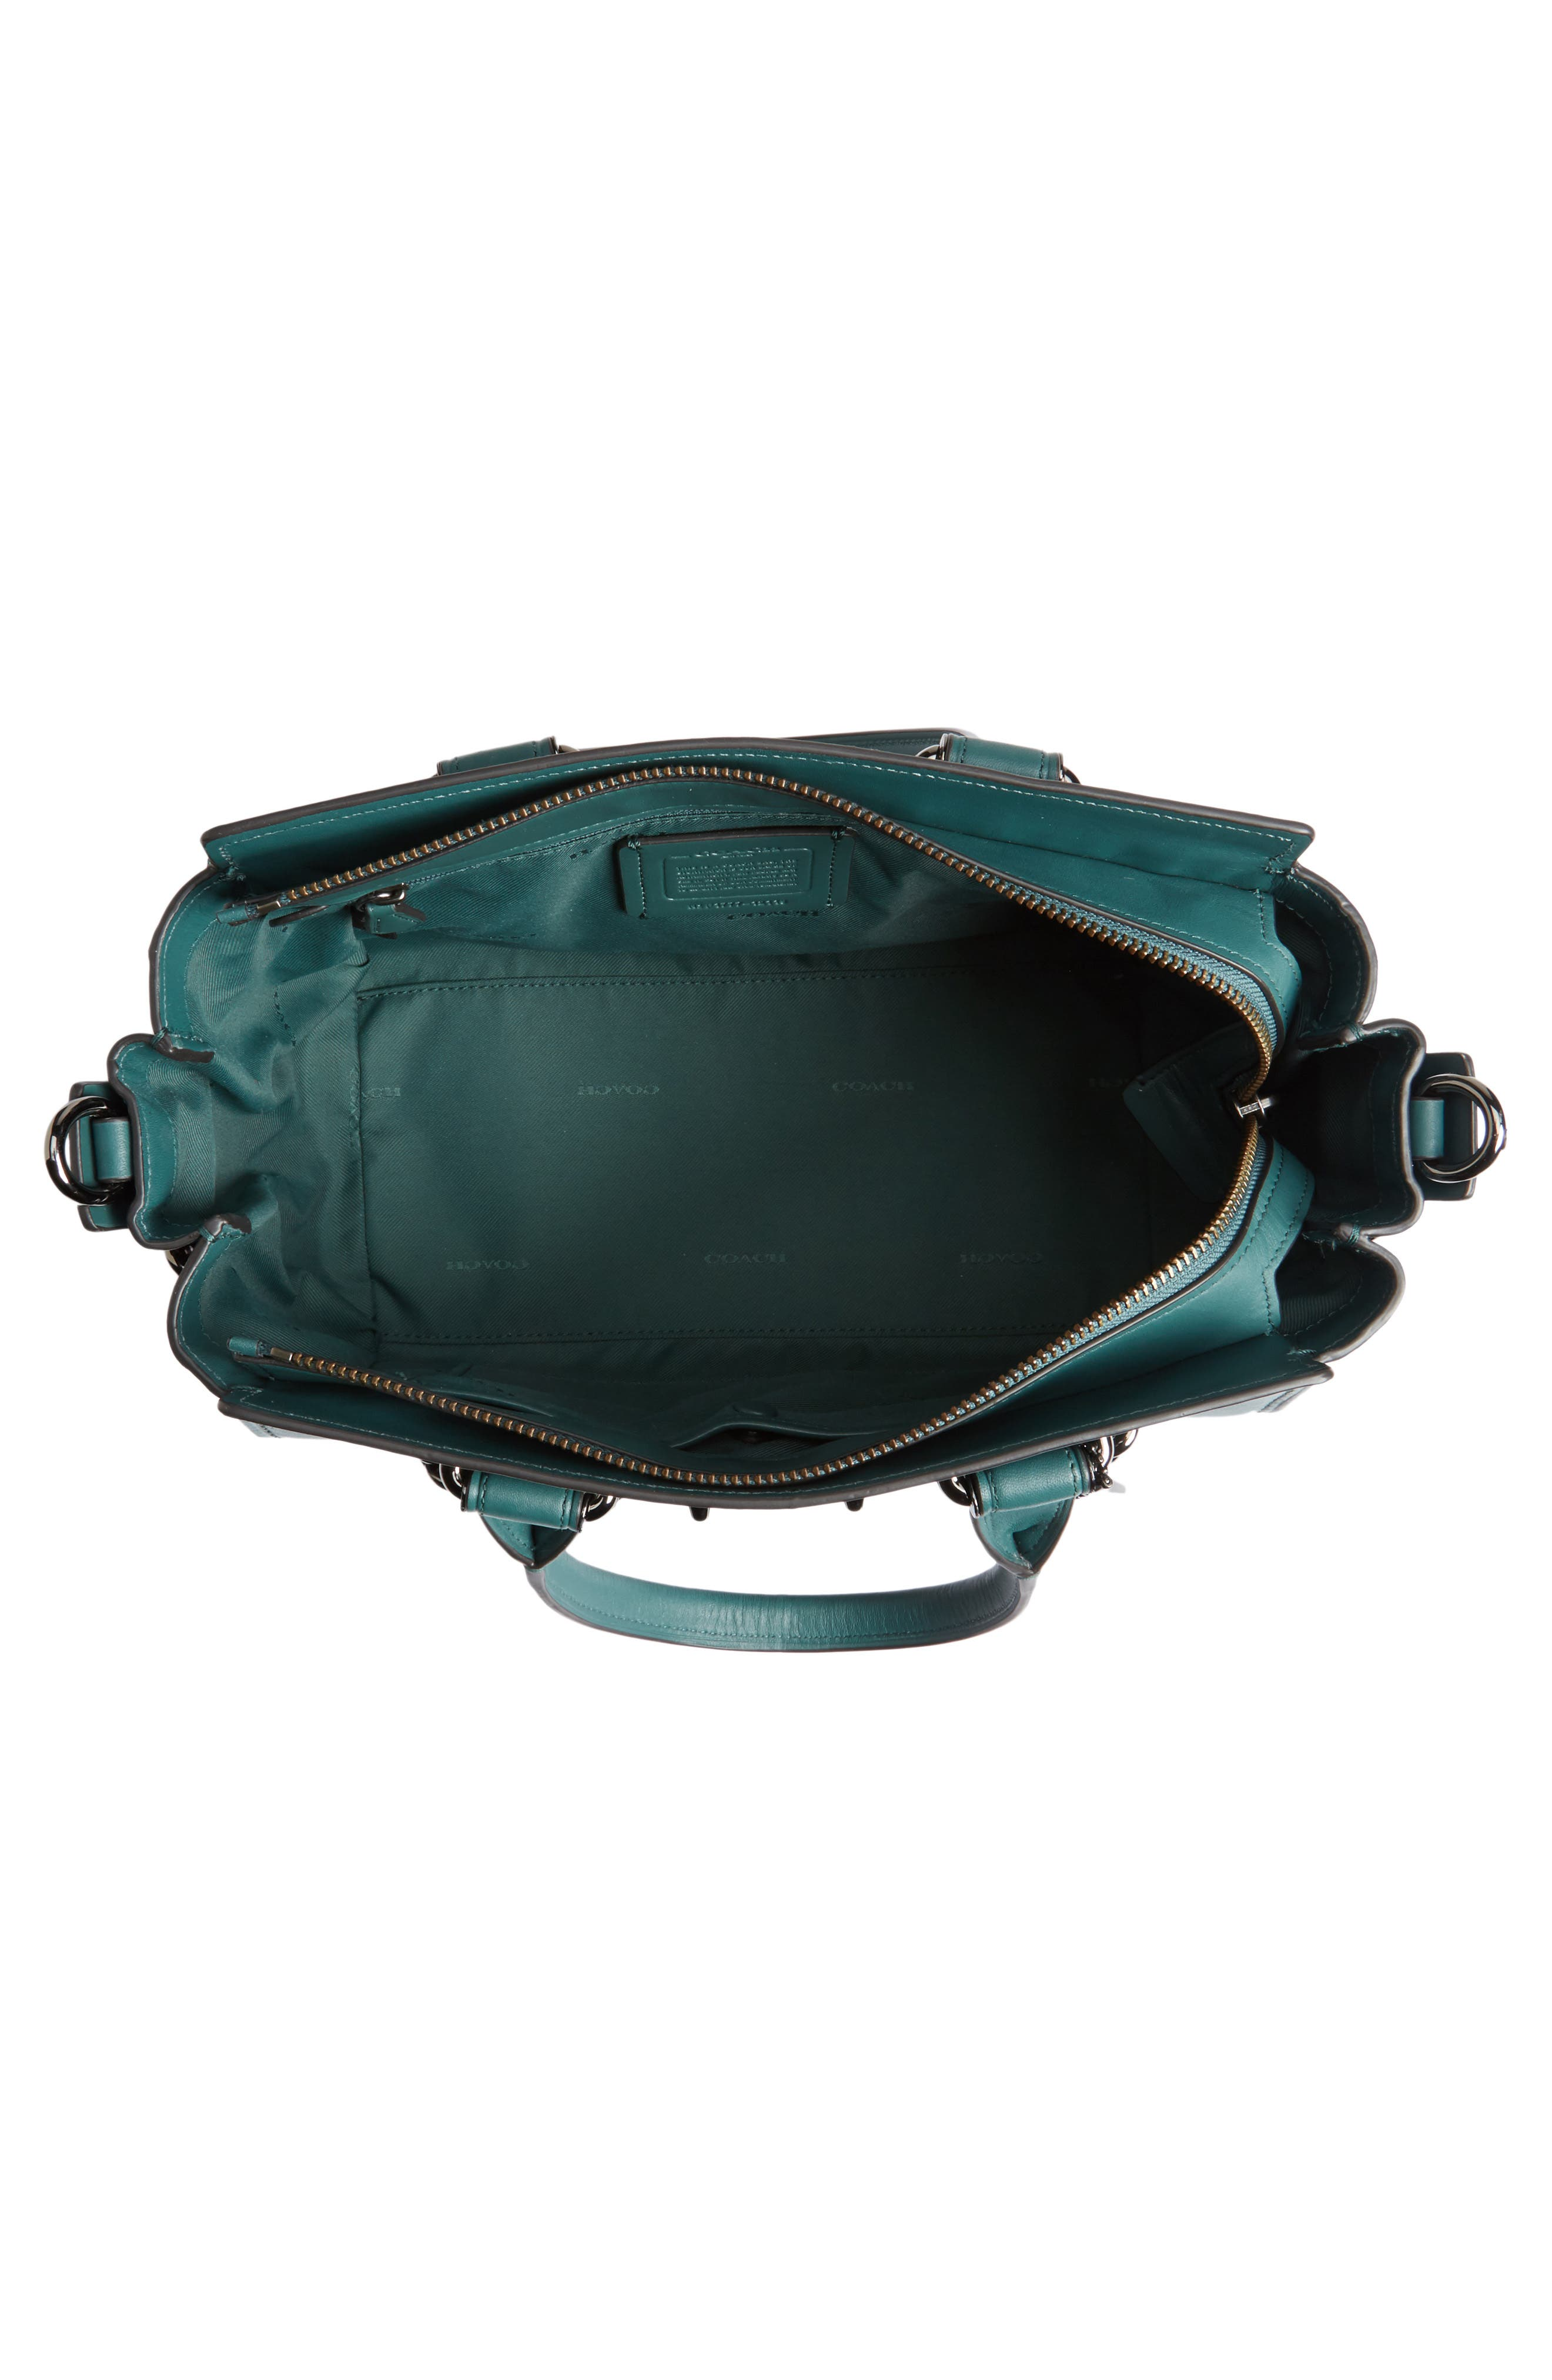 Alternate Image 3  - COACH ID Bracelet Swagger 27 Calfskin Leather Satchel